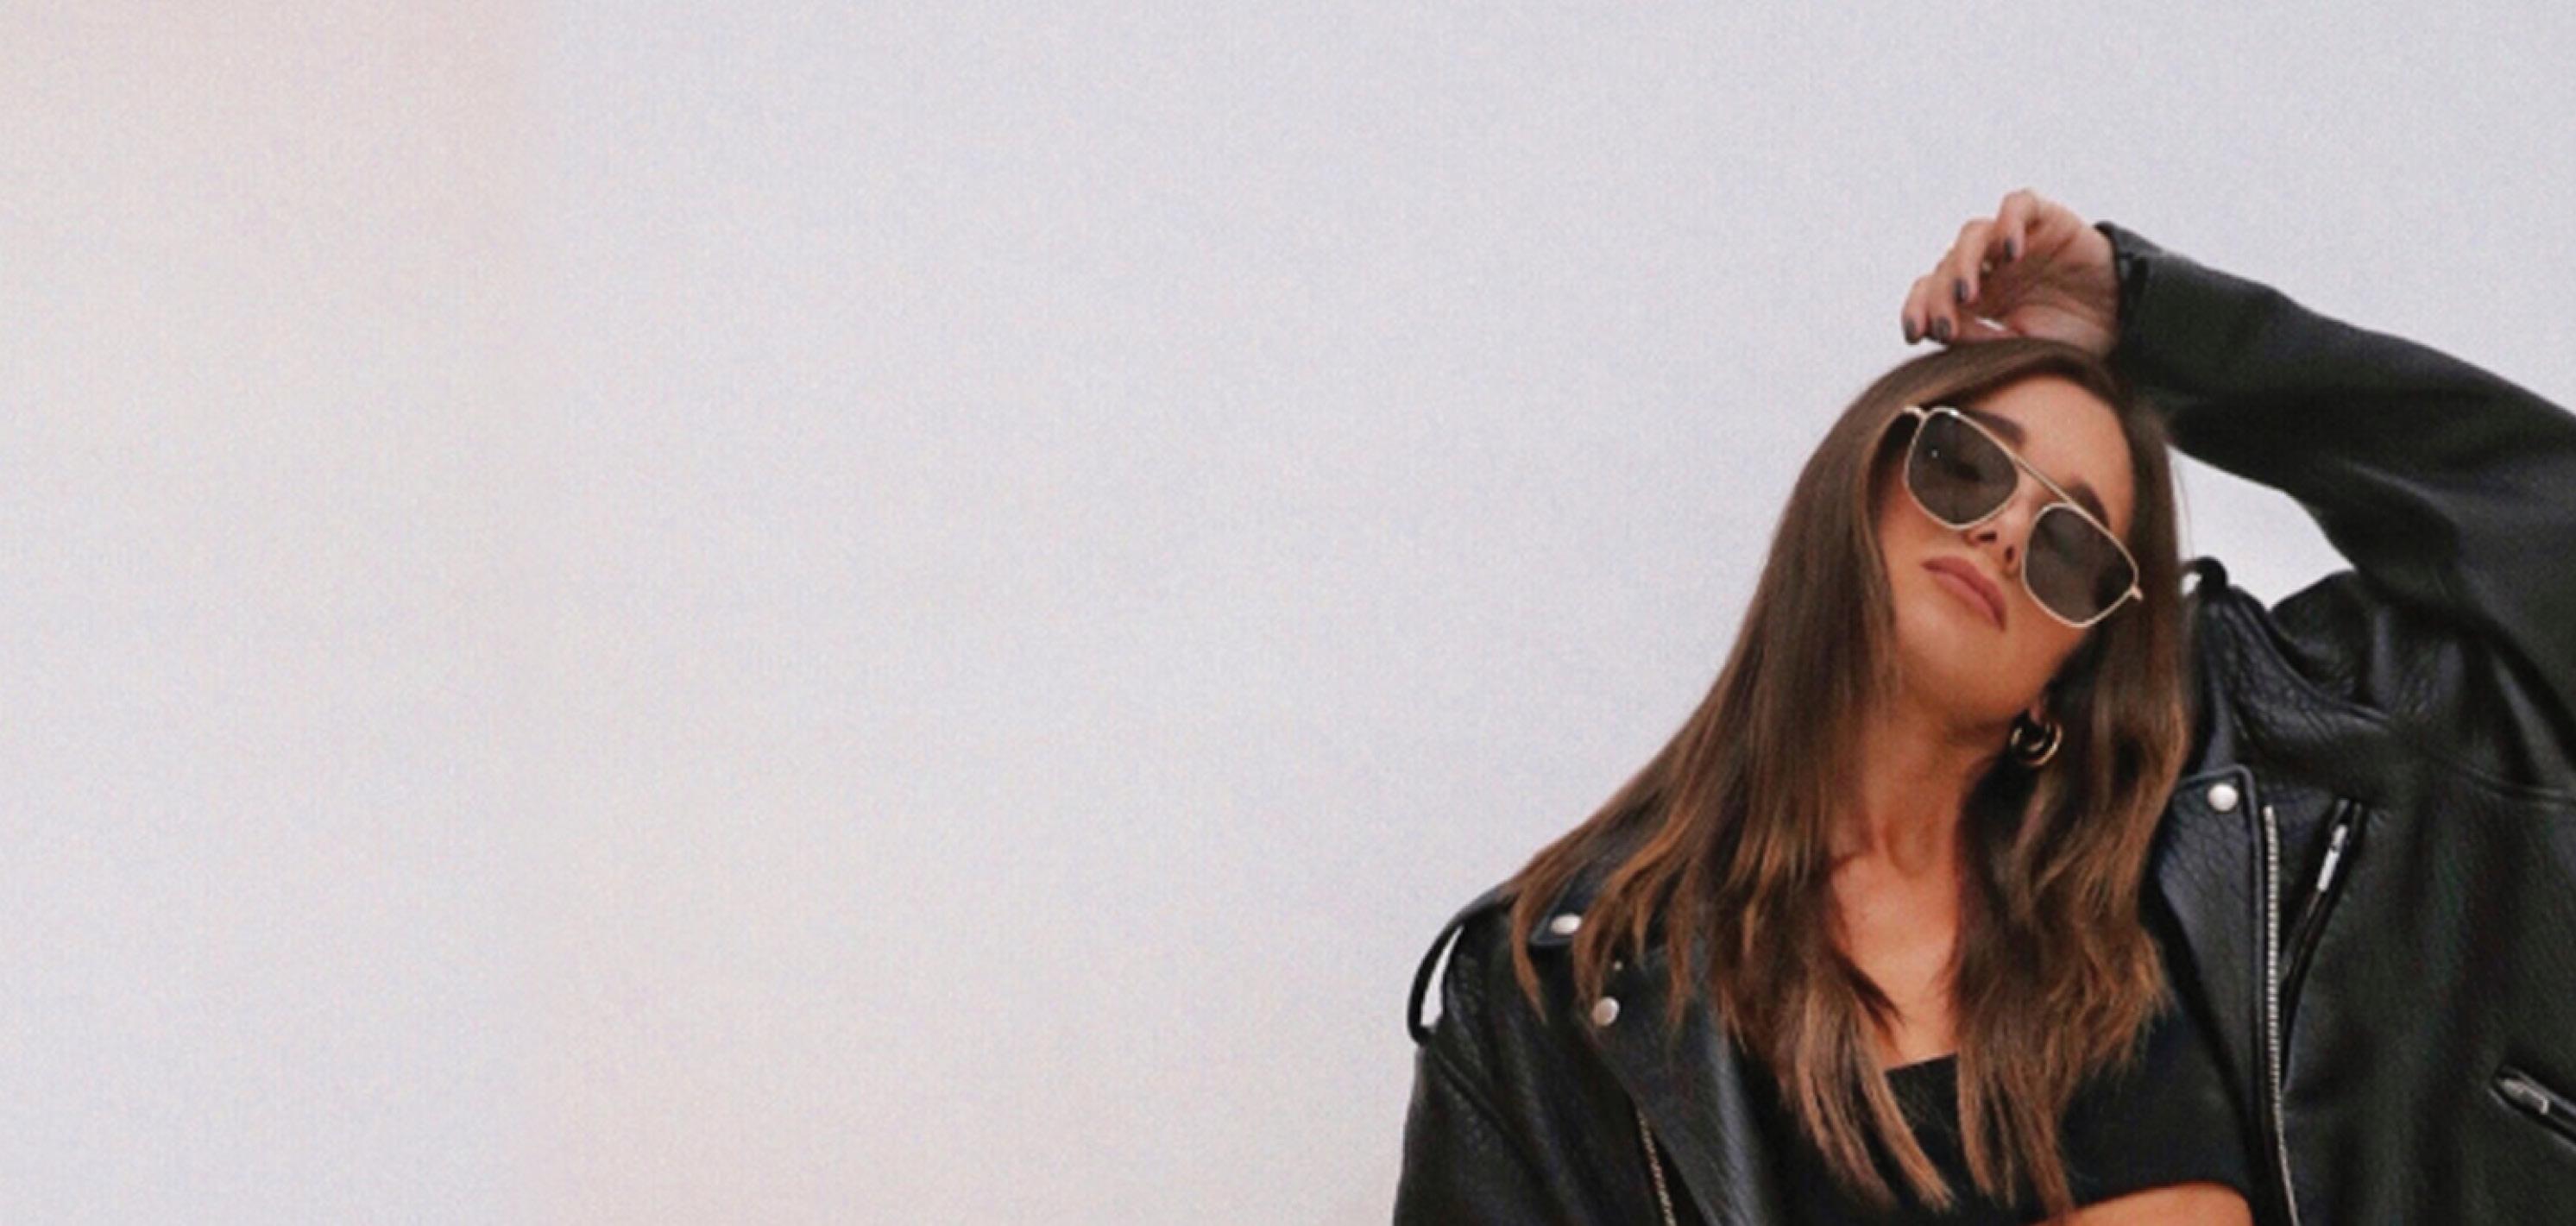 DANIELLE BERNSTEIN, JOE'S JEANS REUNITE AFTER SUCCESSFUL COLLABORATION